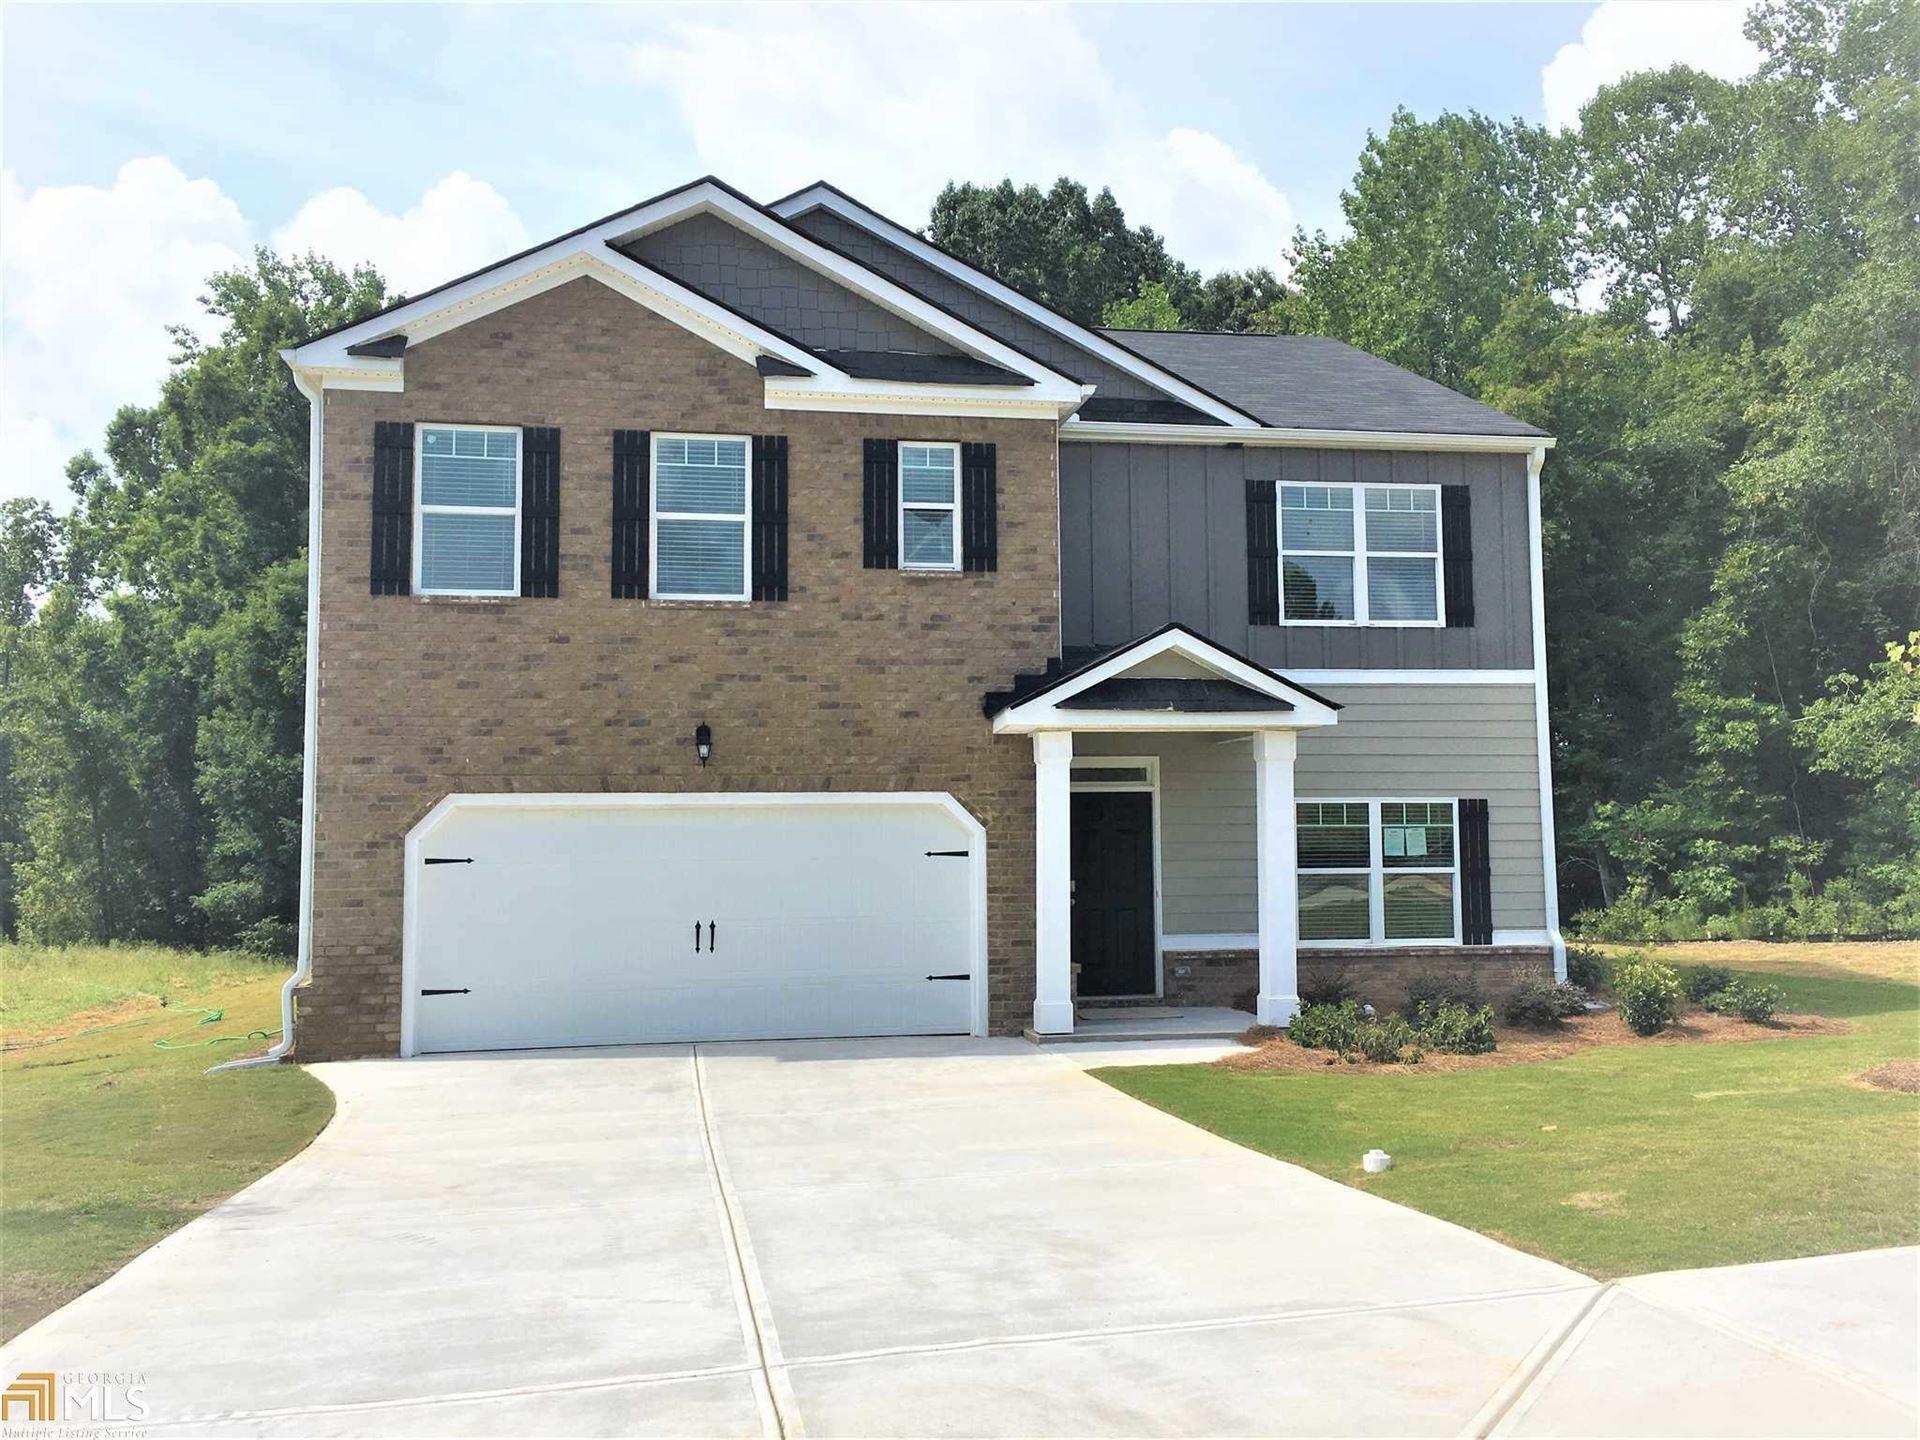 1744 Alford Dr, Jonesboro, GA 30236 - #: 8840587